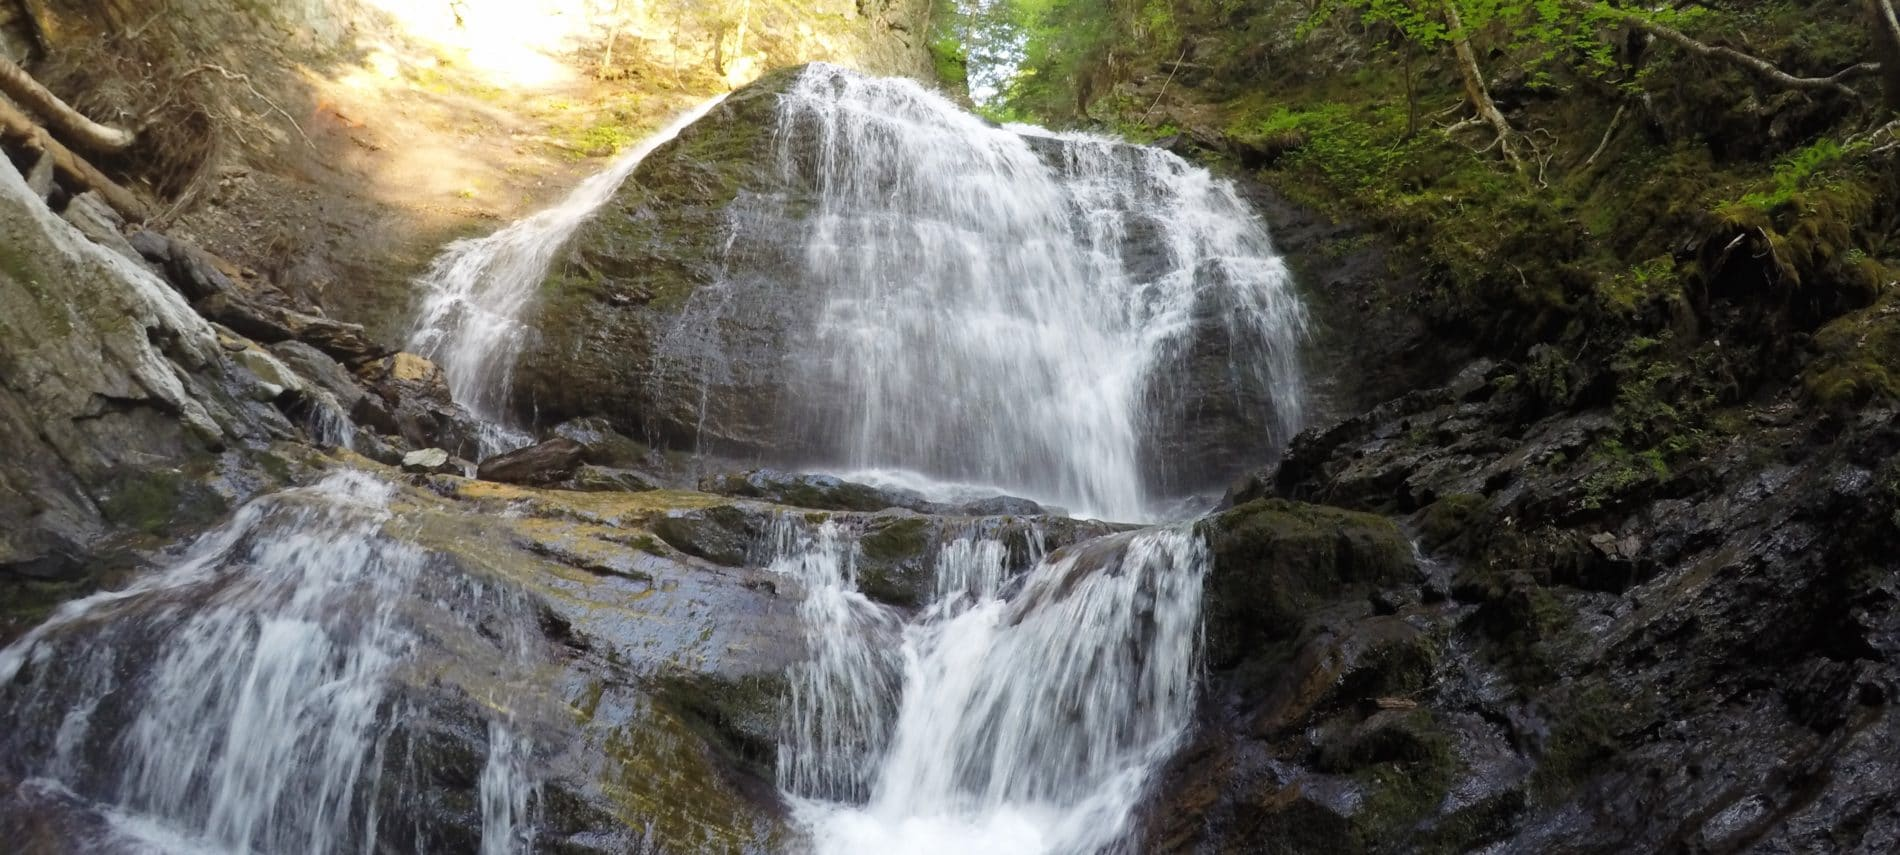 Glen Falls In Highlands Nc Waterfall Nantahala National Forest